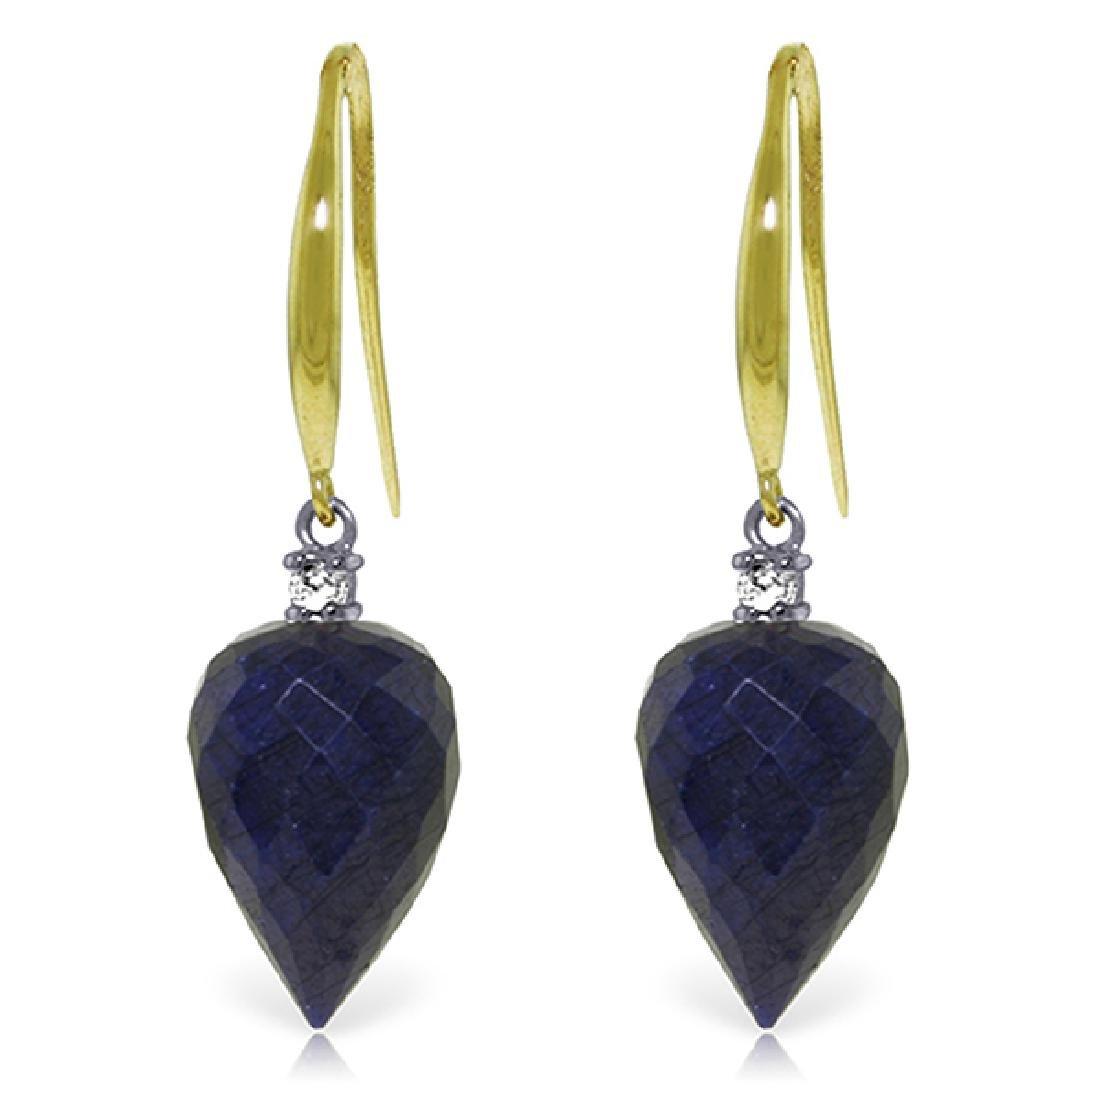 Genuine 25.9 ctw Sapphire & Diamond Earrings Jewelry